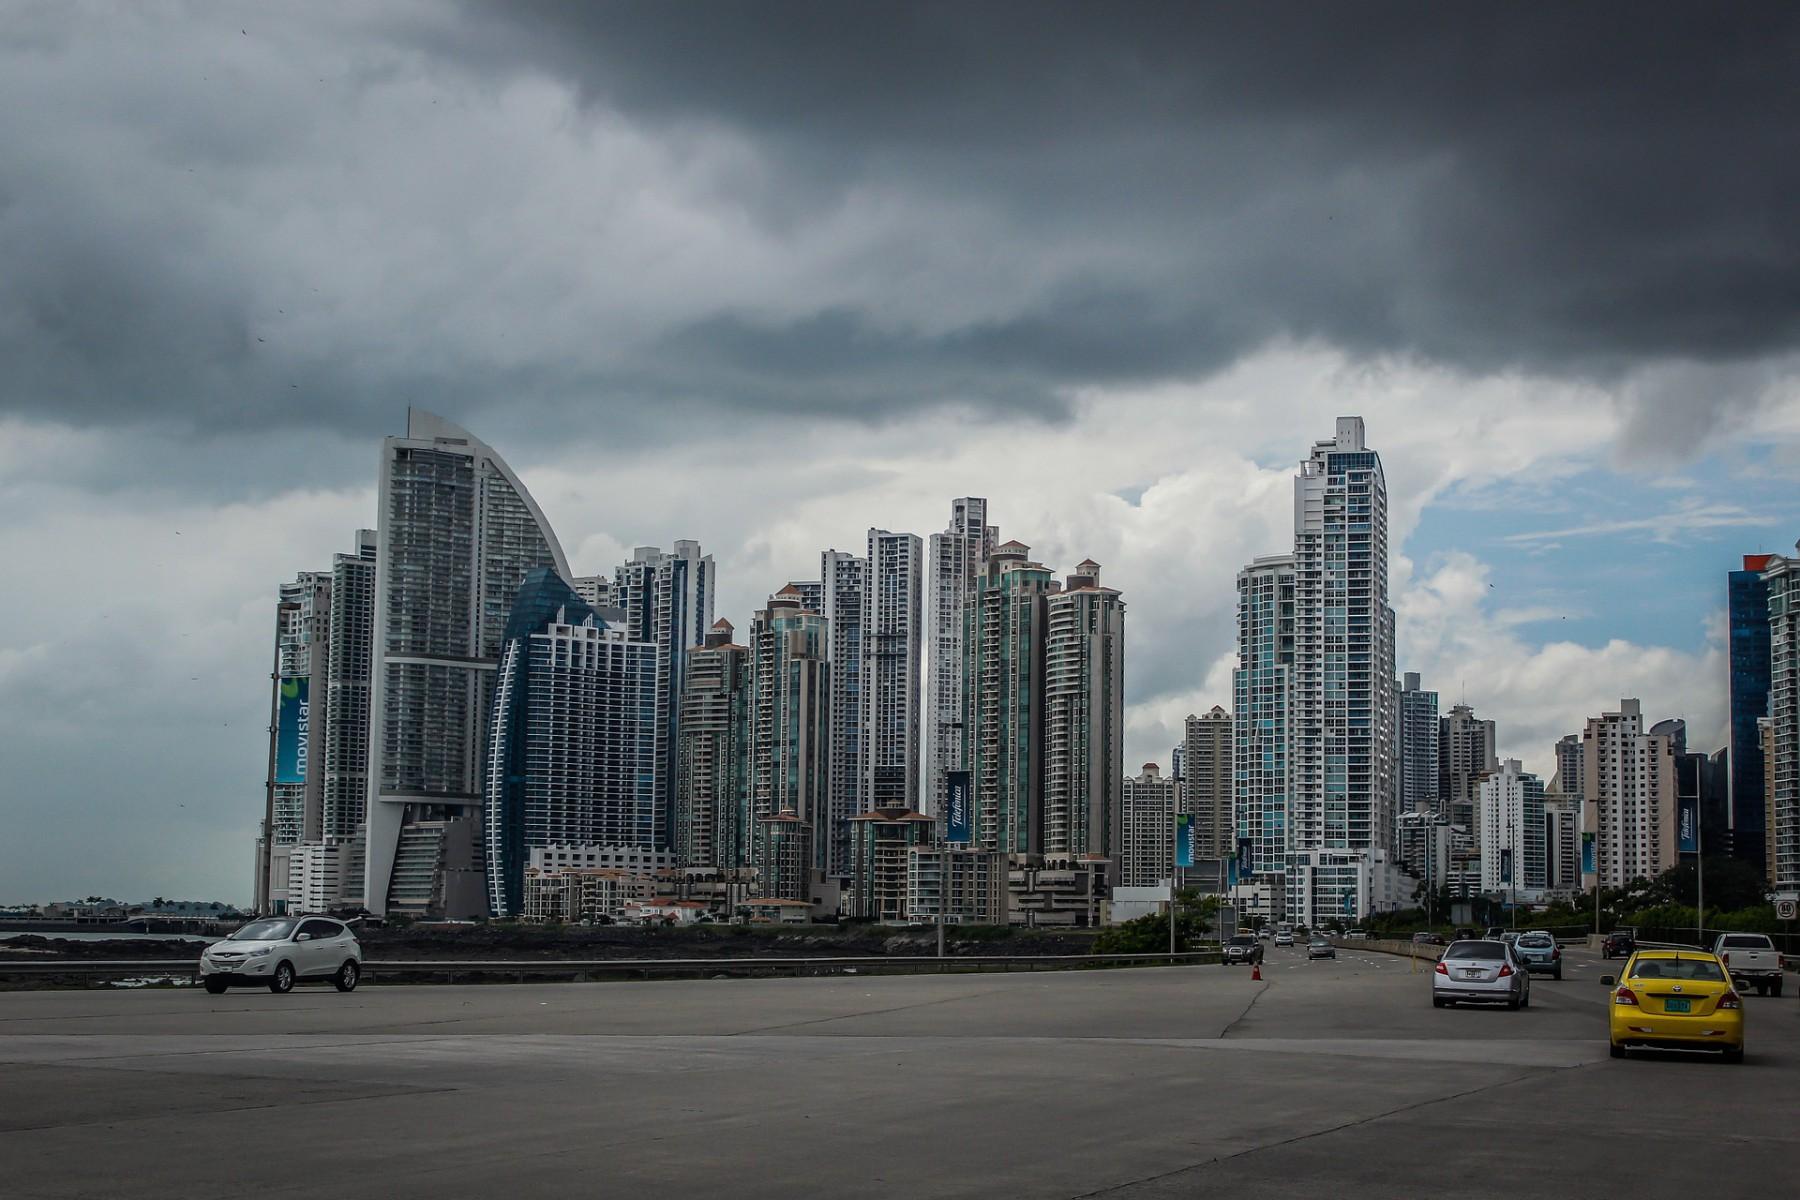 Dunkle Wolken ziehen über Panama auf - panamapapers panamaleaks